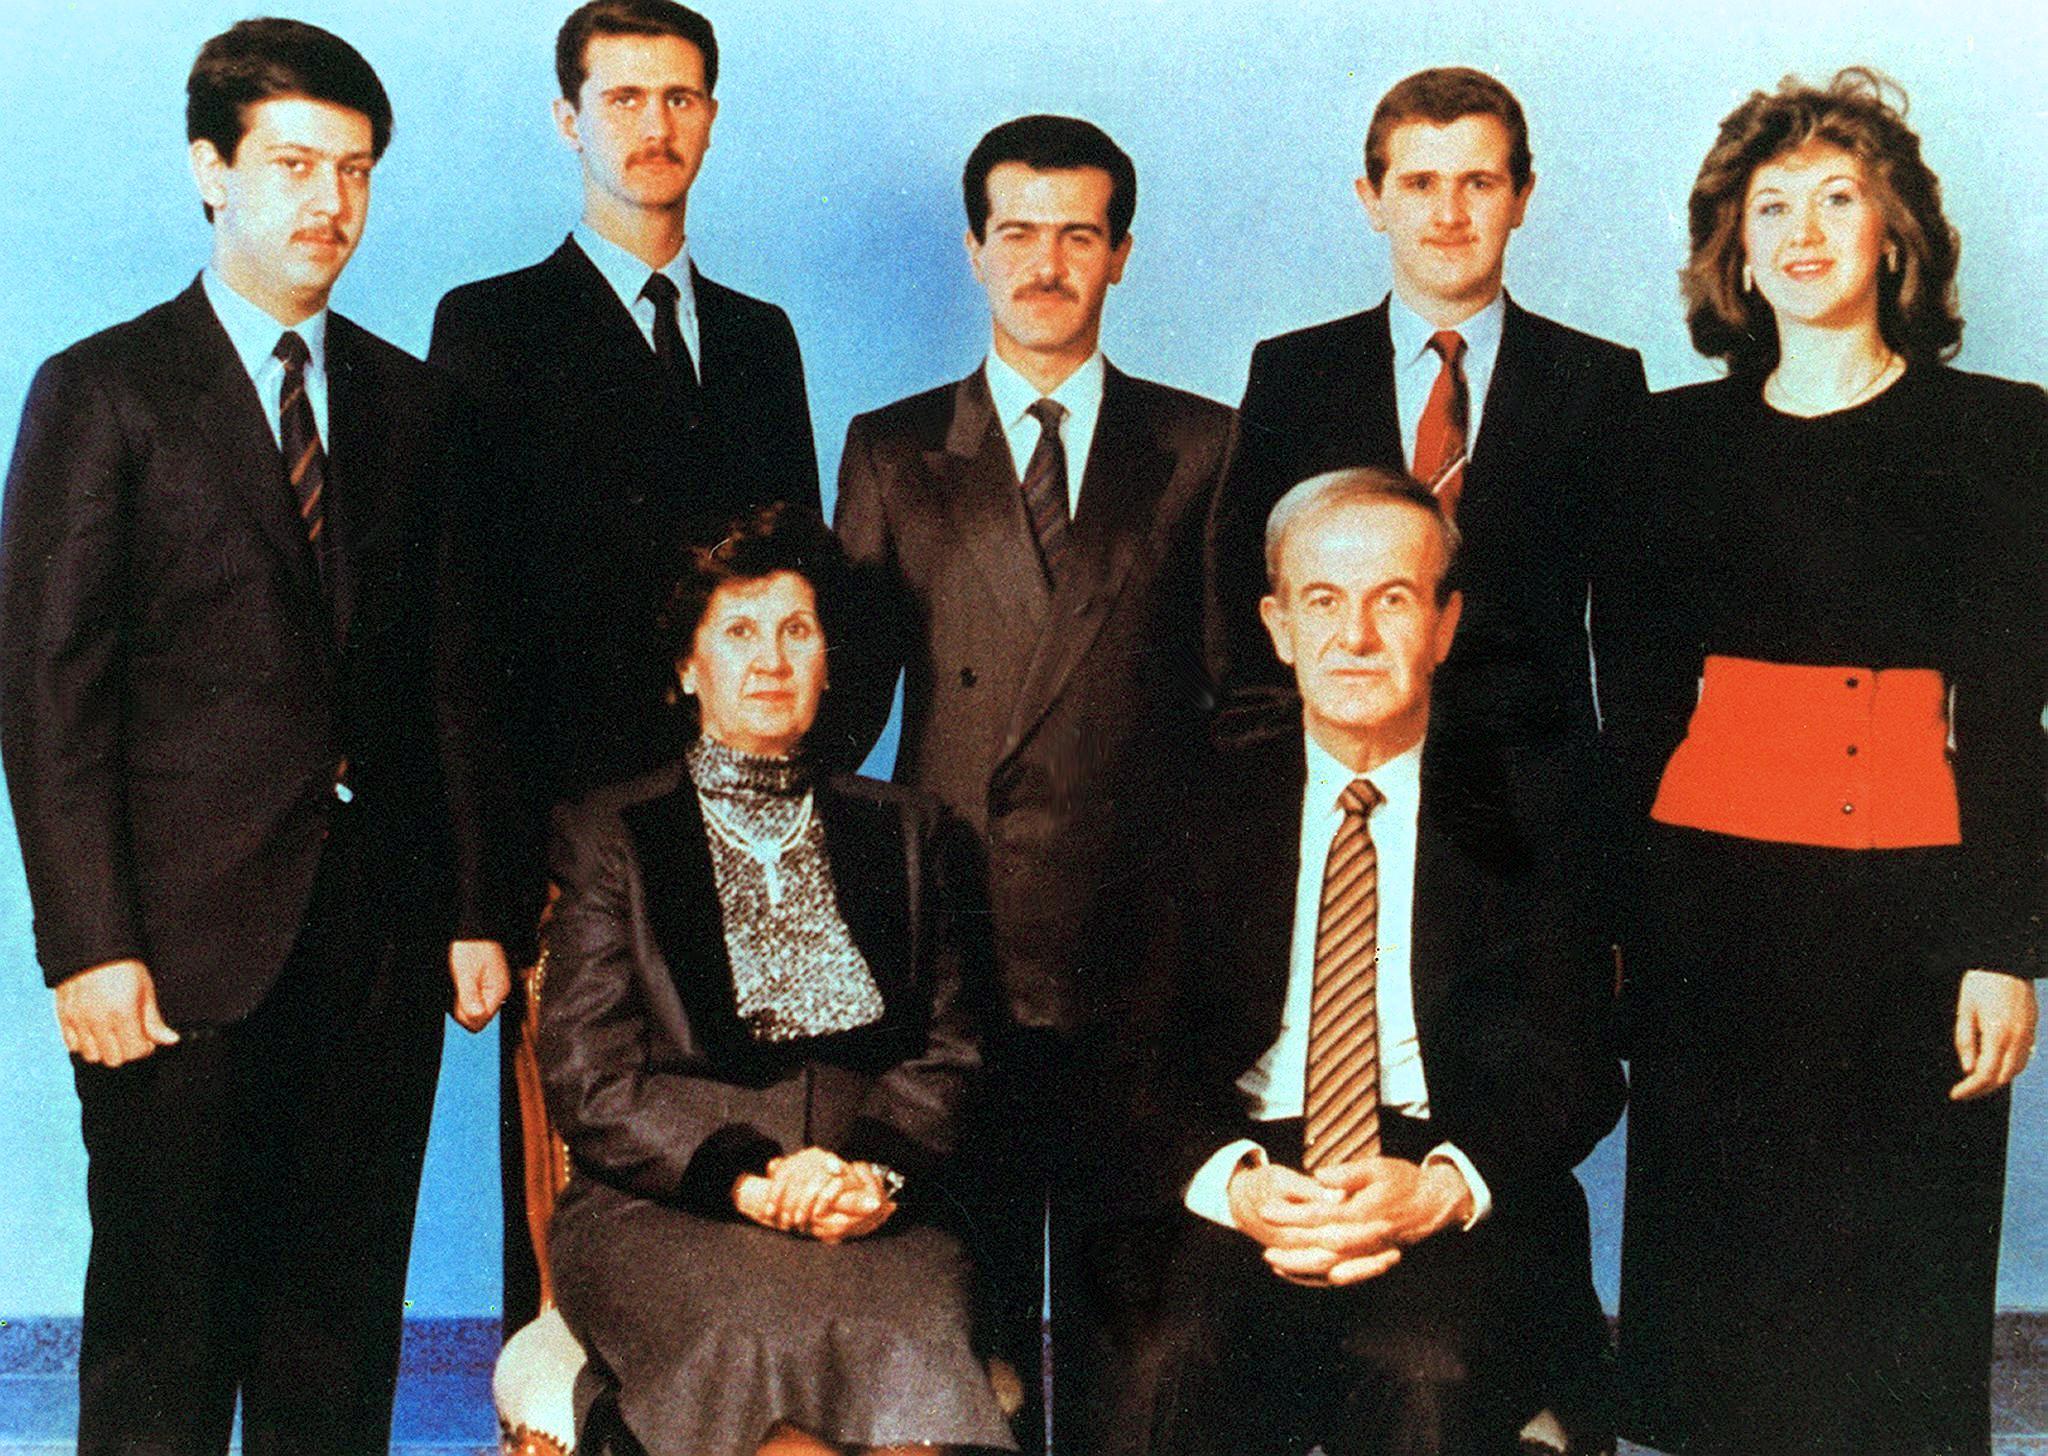 LS1648M Getty Assad family group photo c1990 126341762.jpg